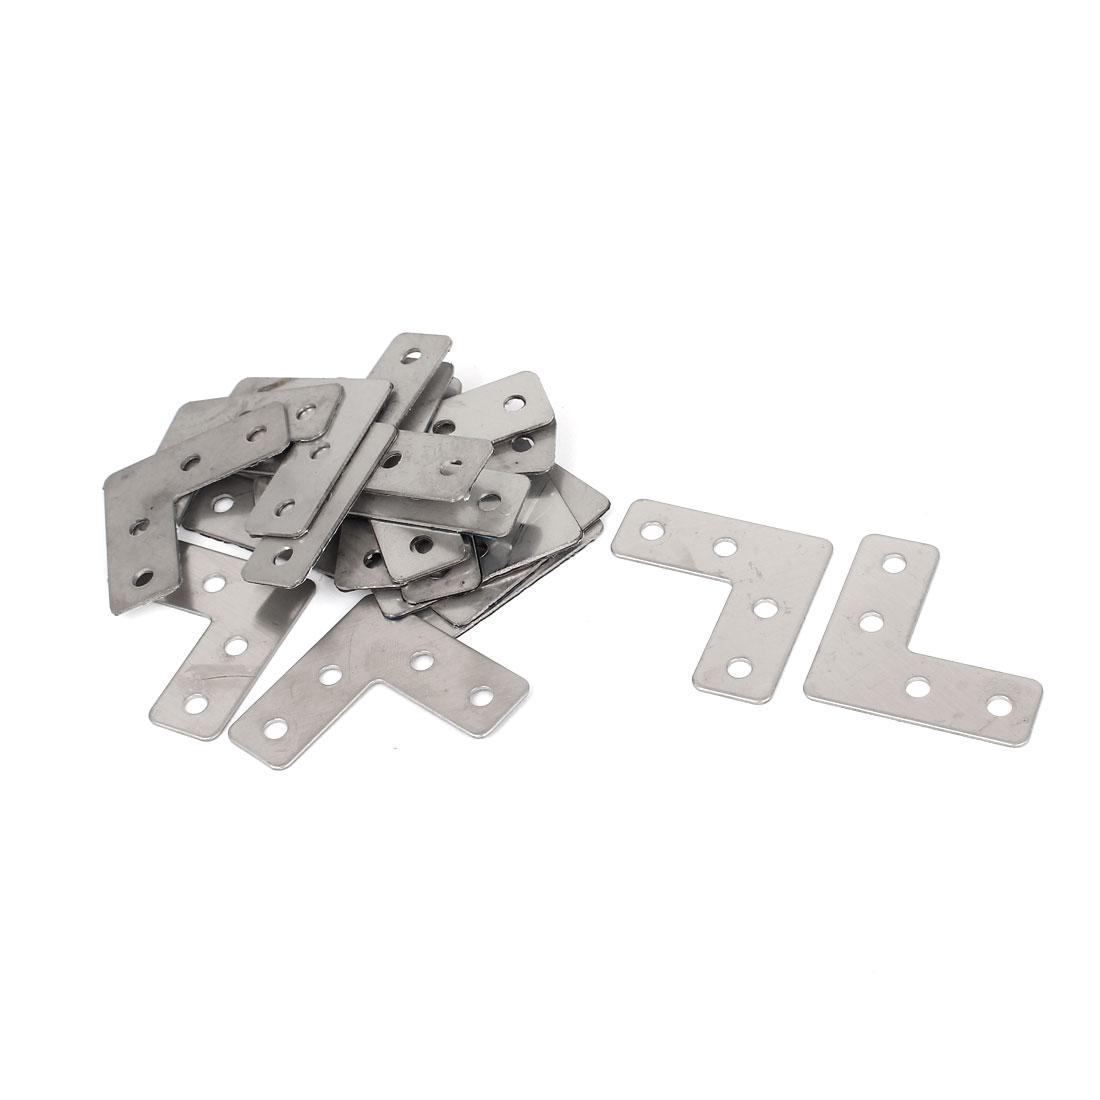 Furniture 40mmx40mm L Shape Right Angle Flat Plate Corner Brace Bracket 20Pcs